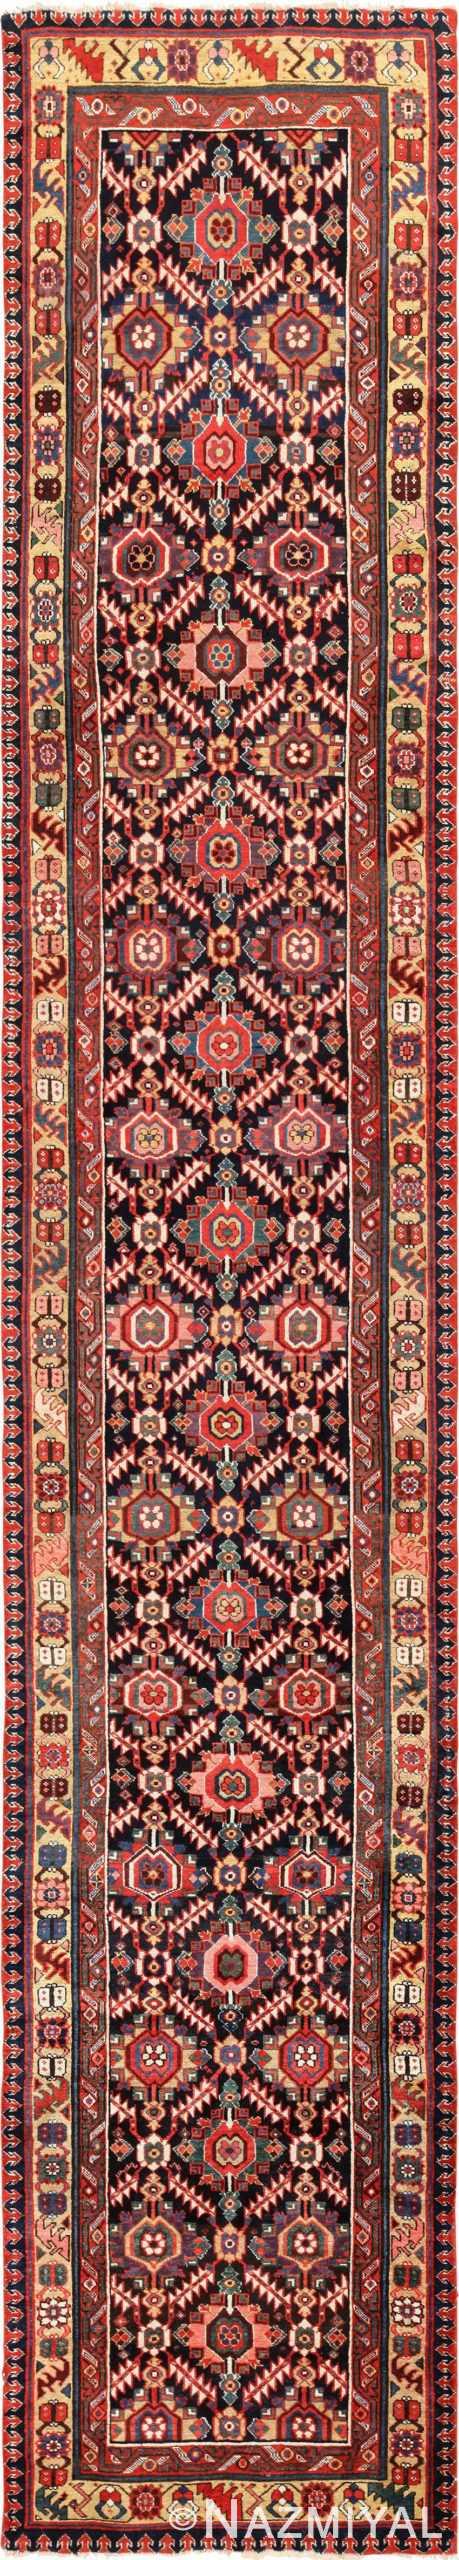 Tribal Long Antique Navy Blue Northwest Persian Runner Rug #49586 - nazmiyal